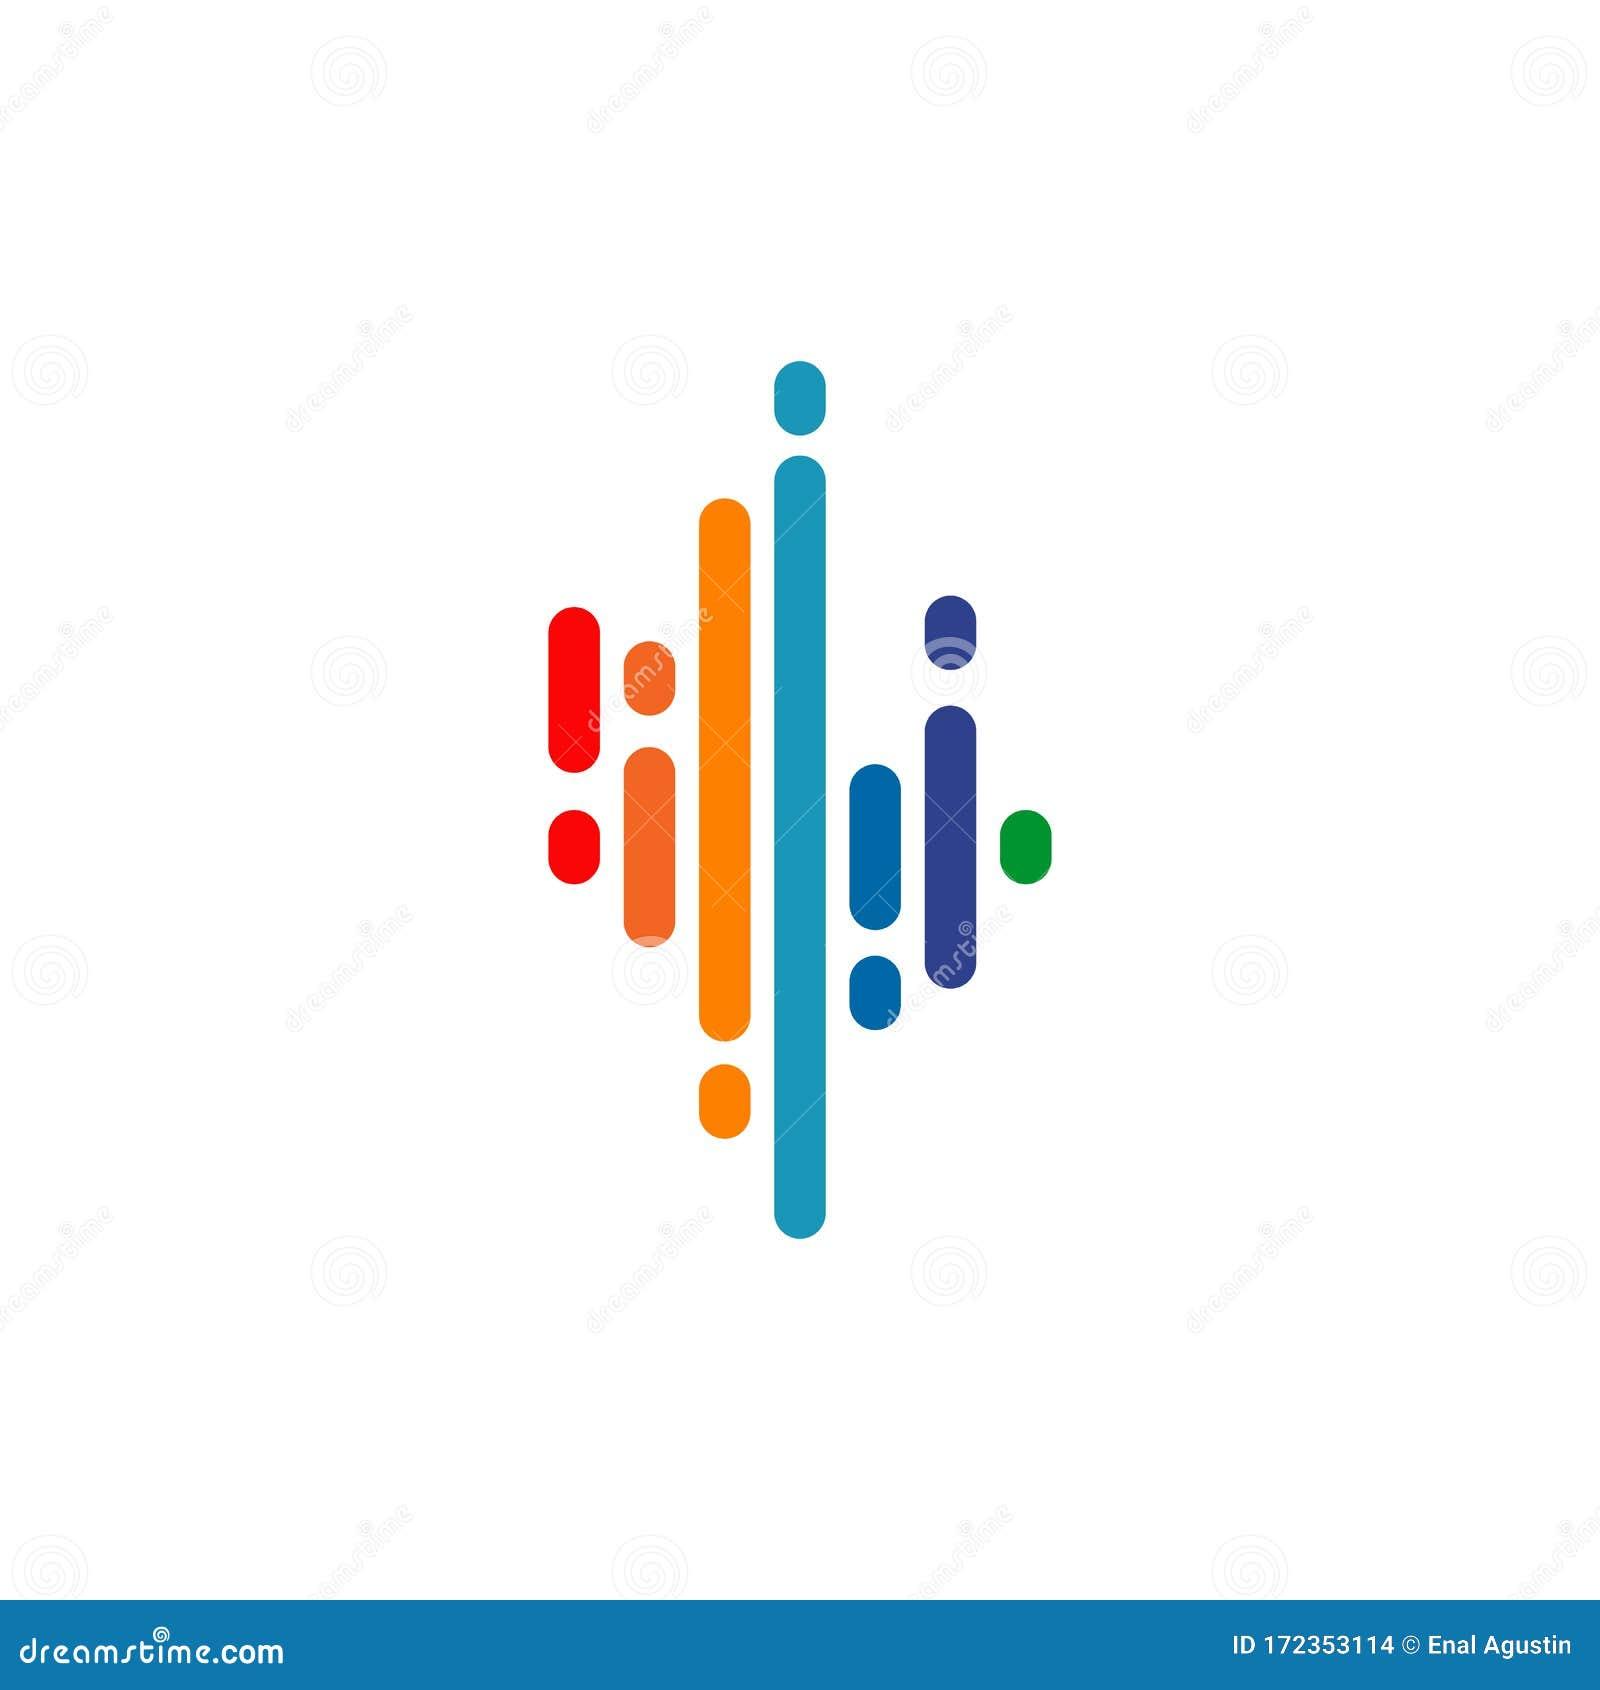 Podcastlogo Examples